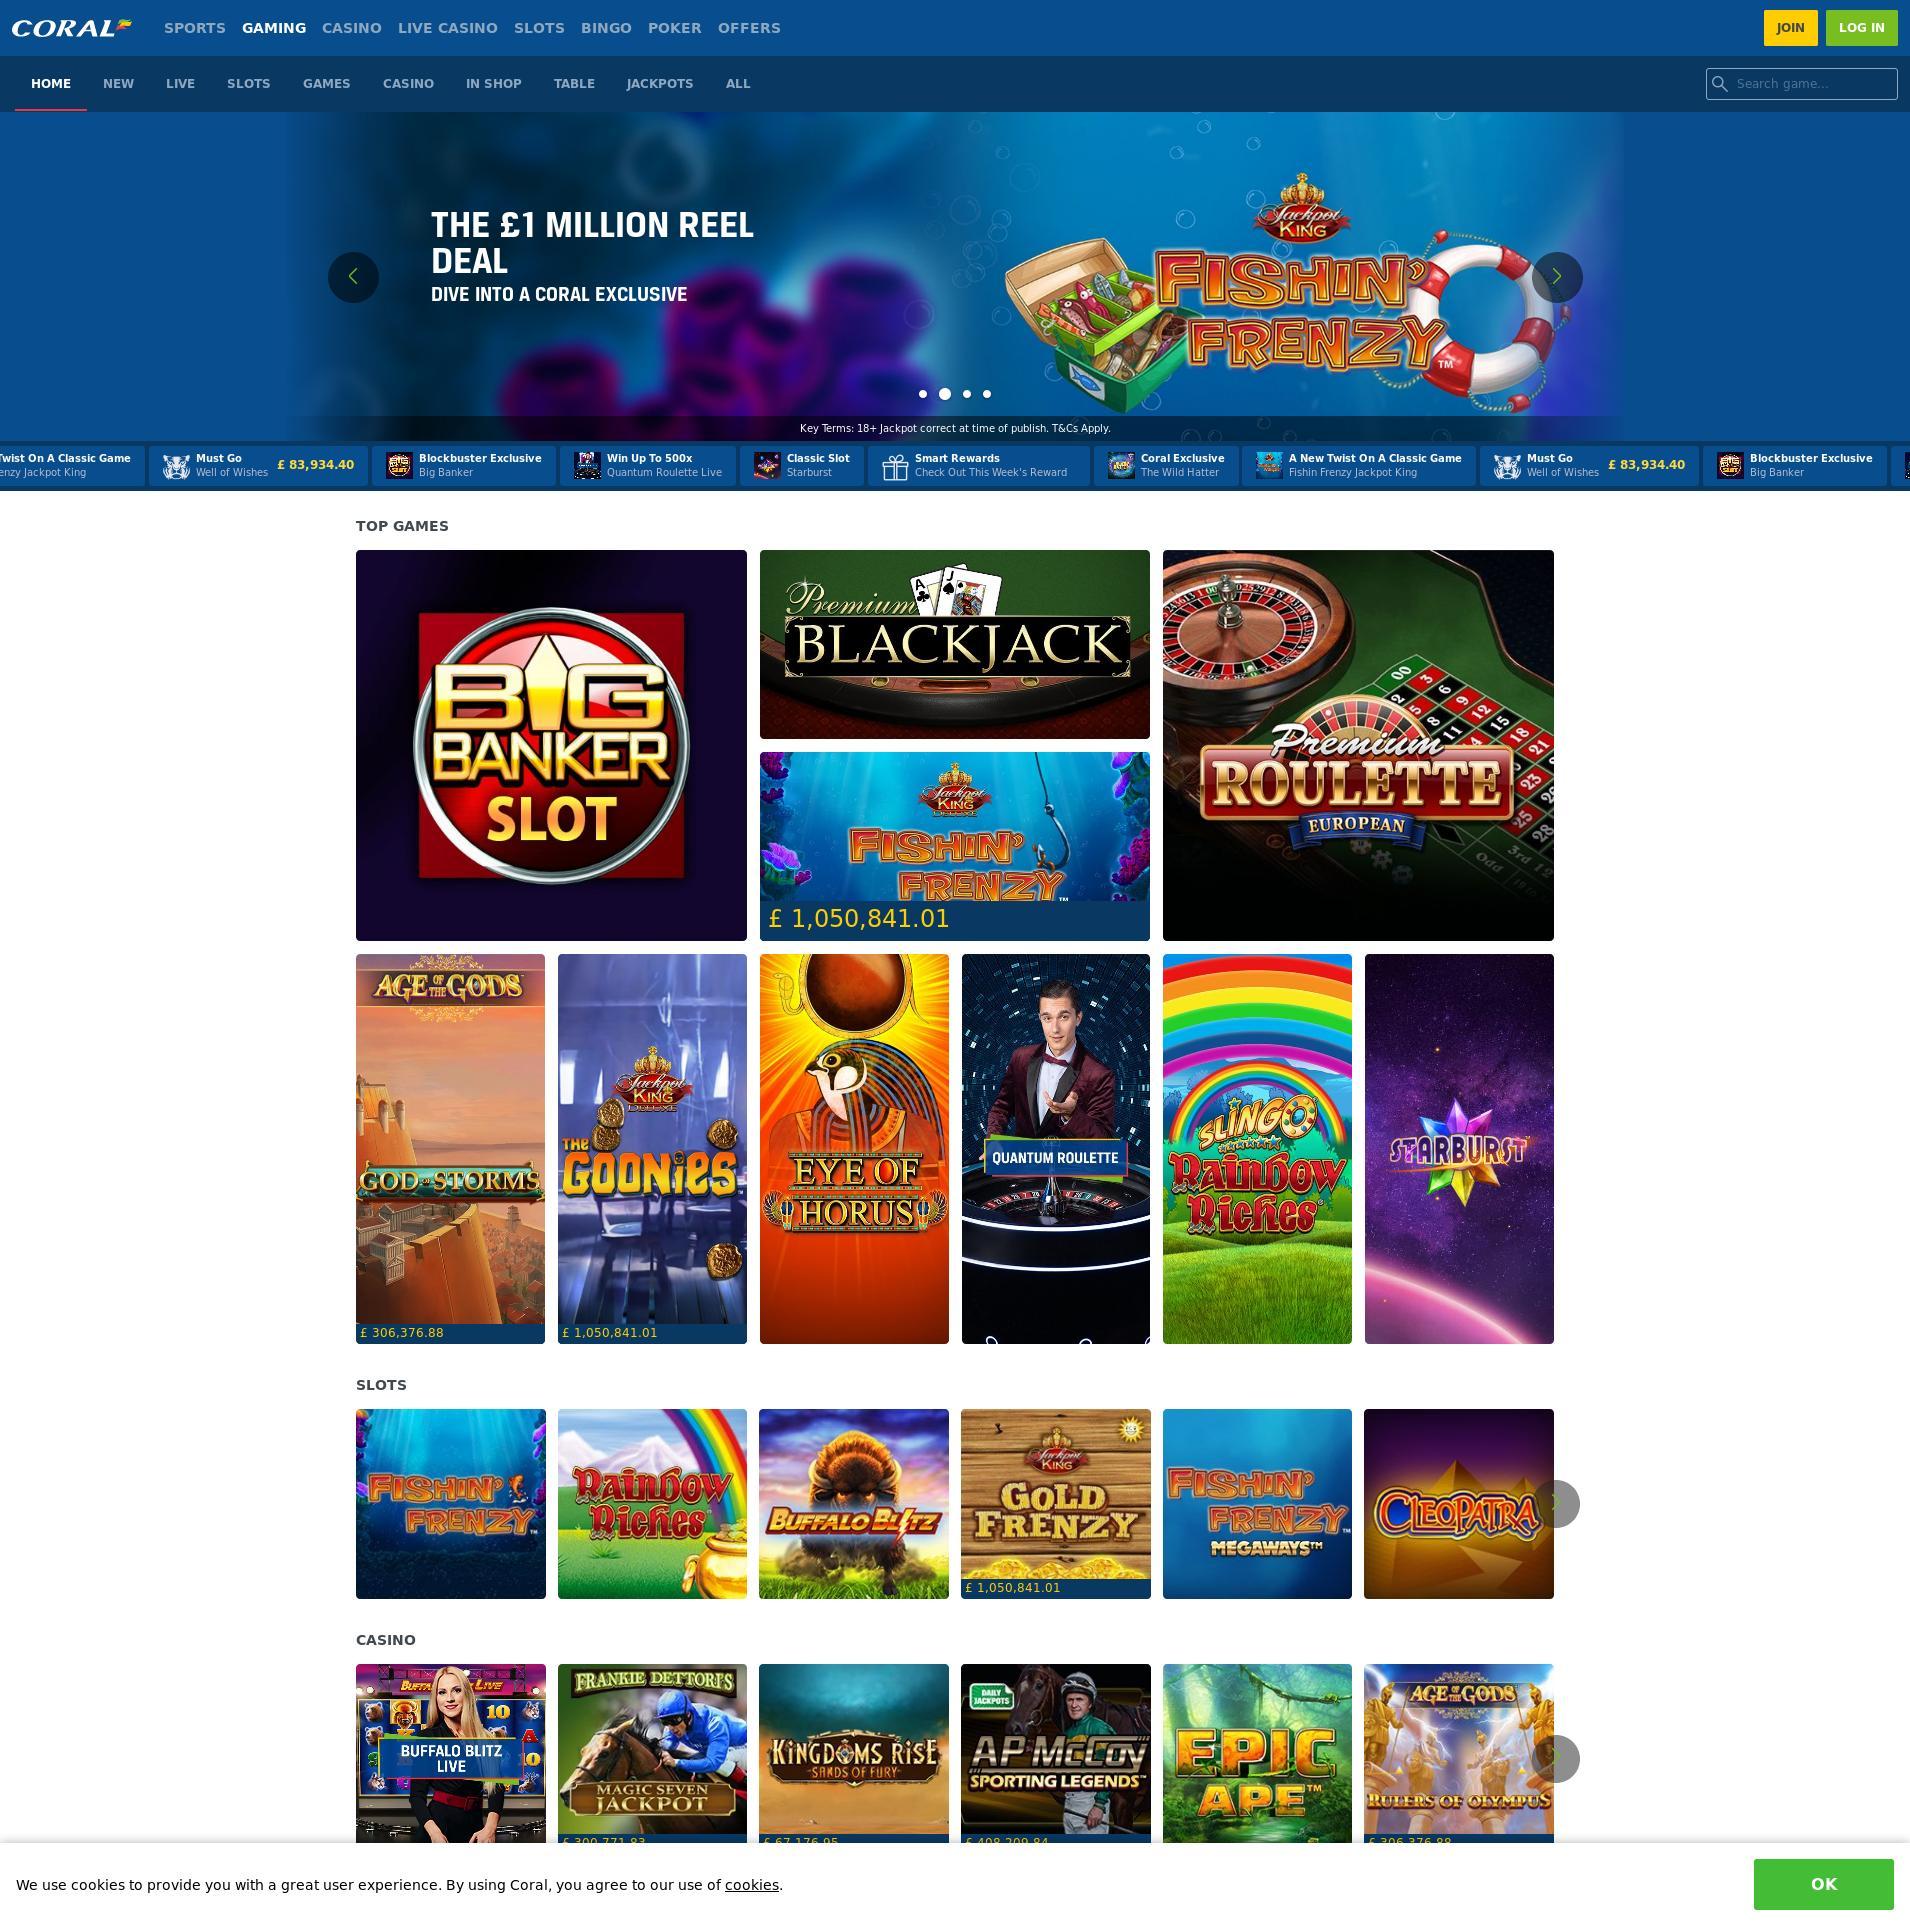 Casino screen Lobby 2020-01-21 for United Kingdom